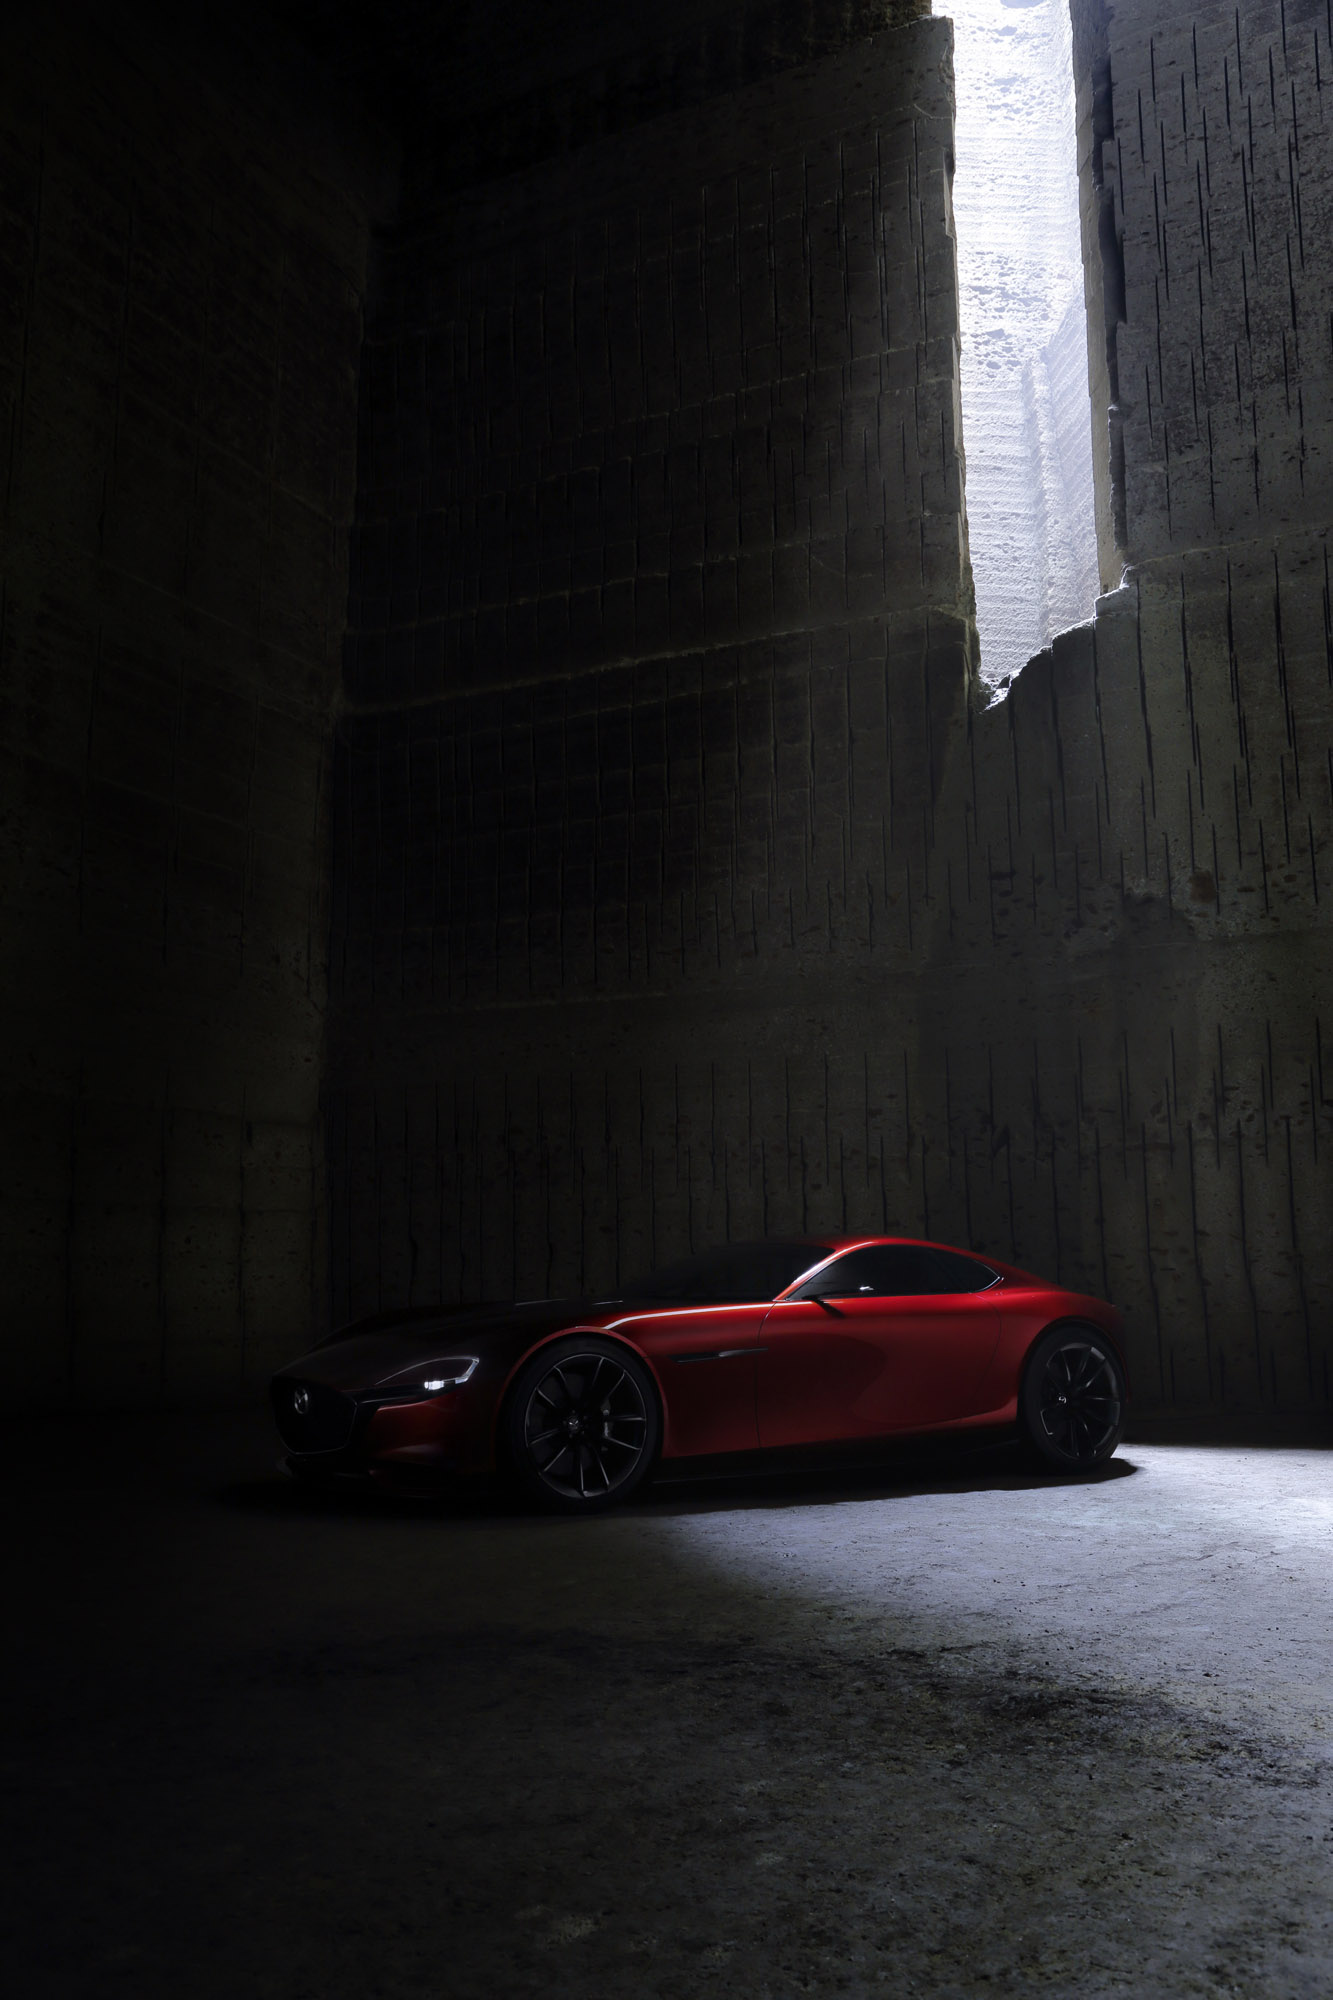 https://www.automobilesreview.com/gallery/2015-mazda-rx-vision-concept/2015-mazda-rx-vision-concept-03.jpg